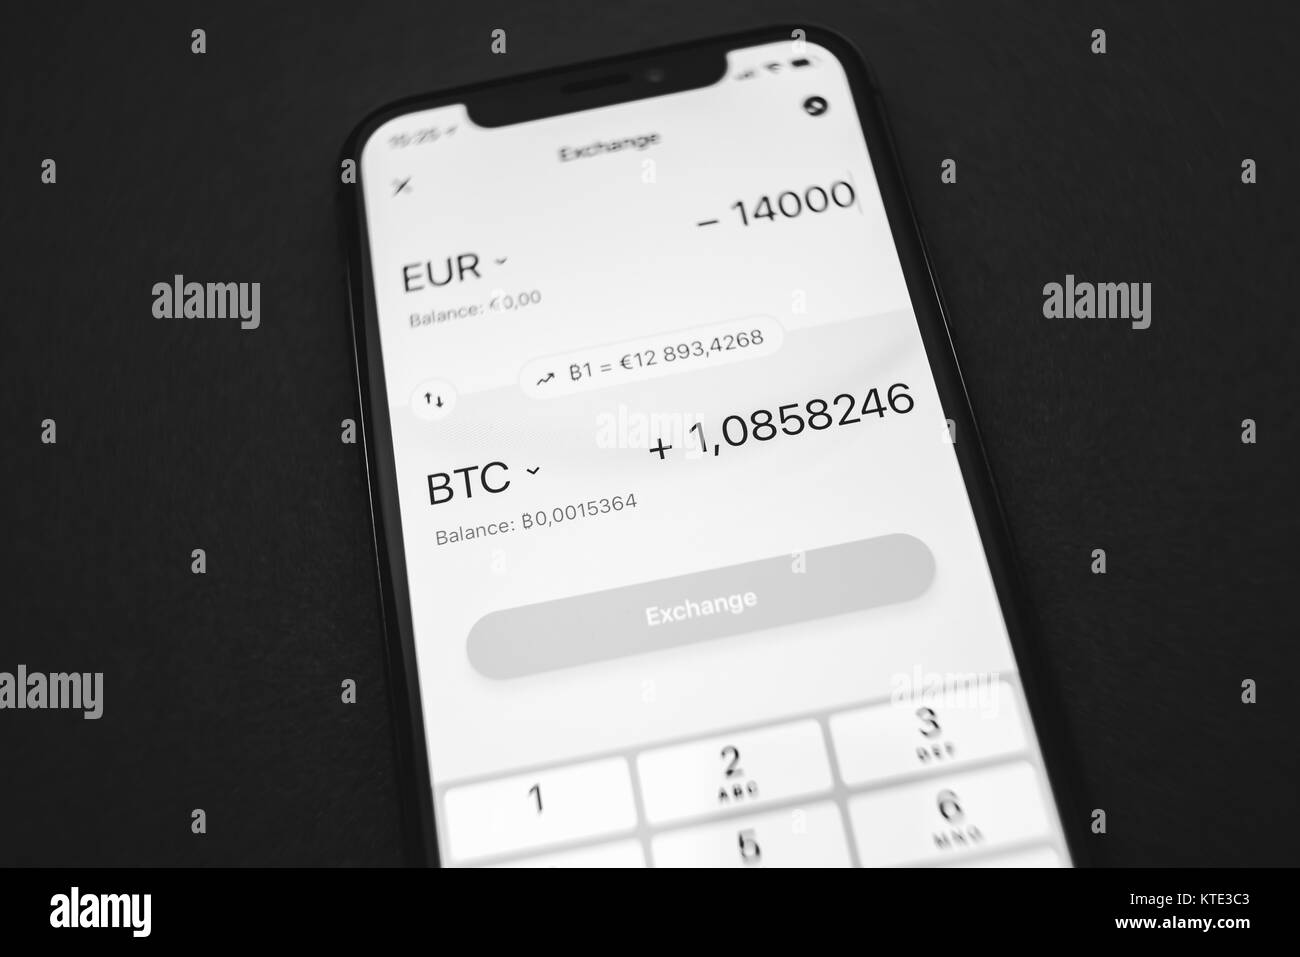 KAUNAS, LITHUANIA - DECEMBER 23, 2017: Exchange rate of Bitcoin